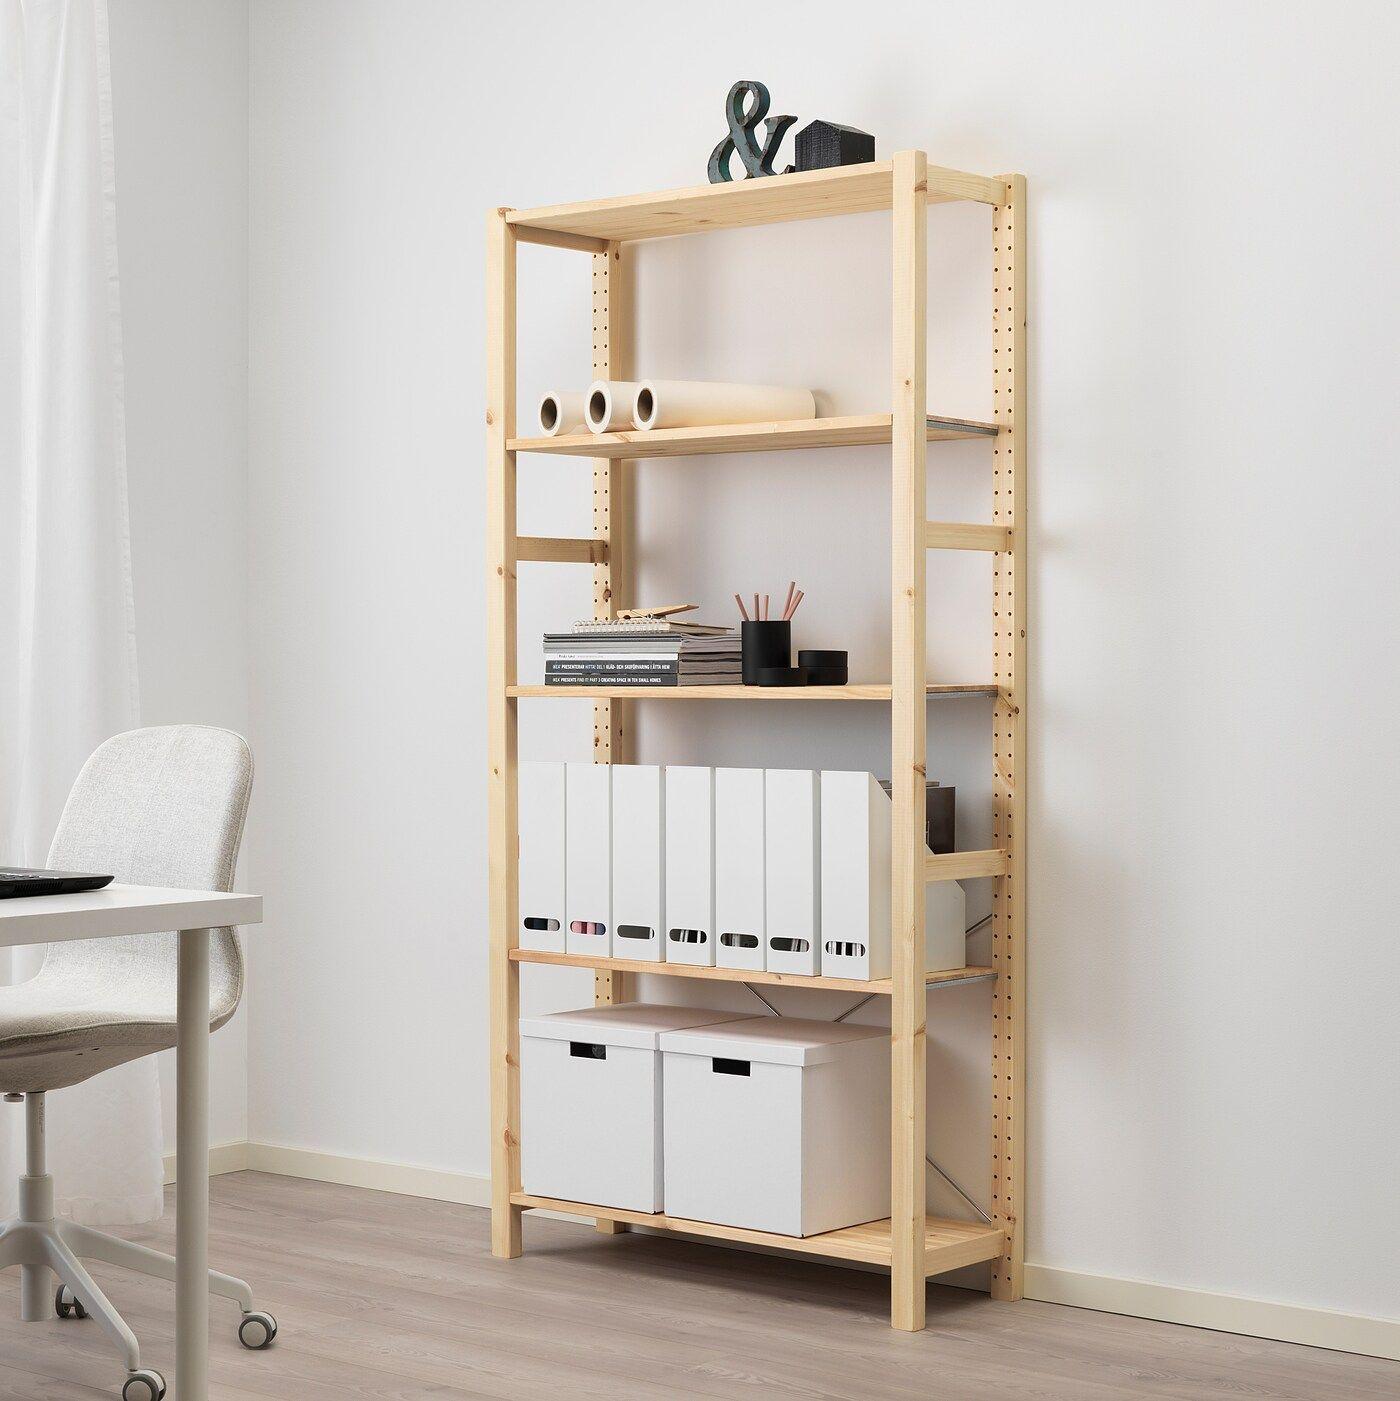 Ikea Ivar Pine Shelf Unit In 2020 Shelves Ikea Ikea Shelving Unit